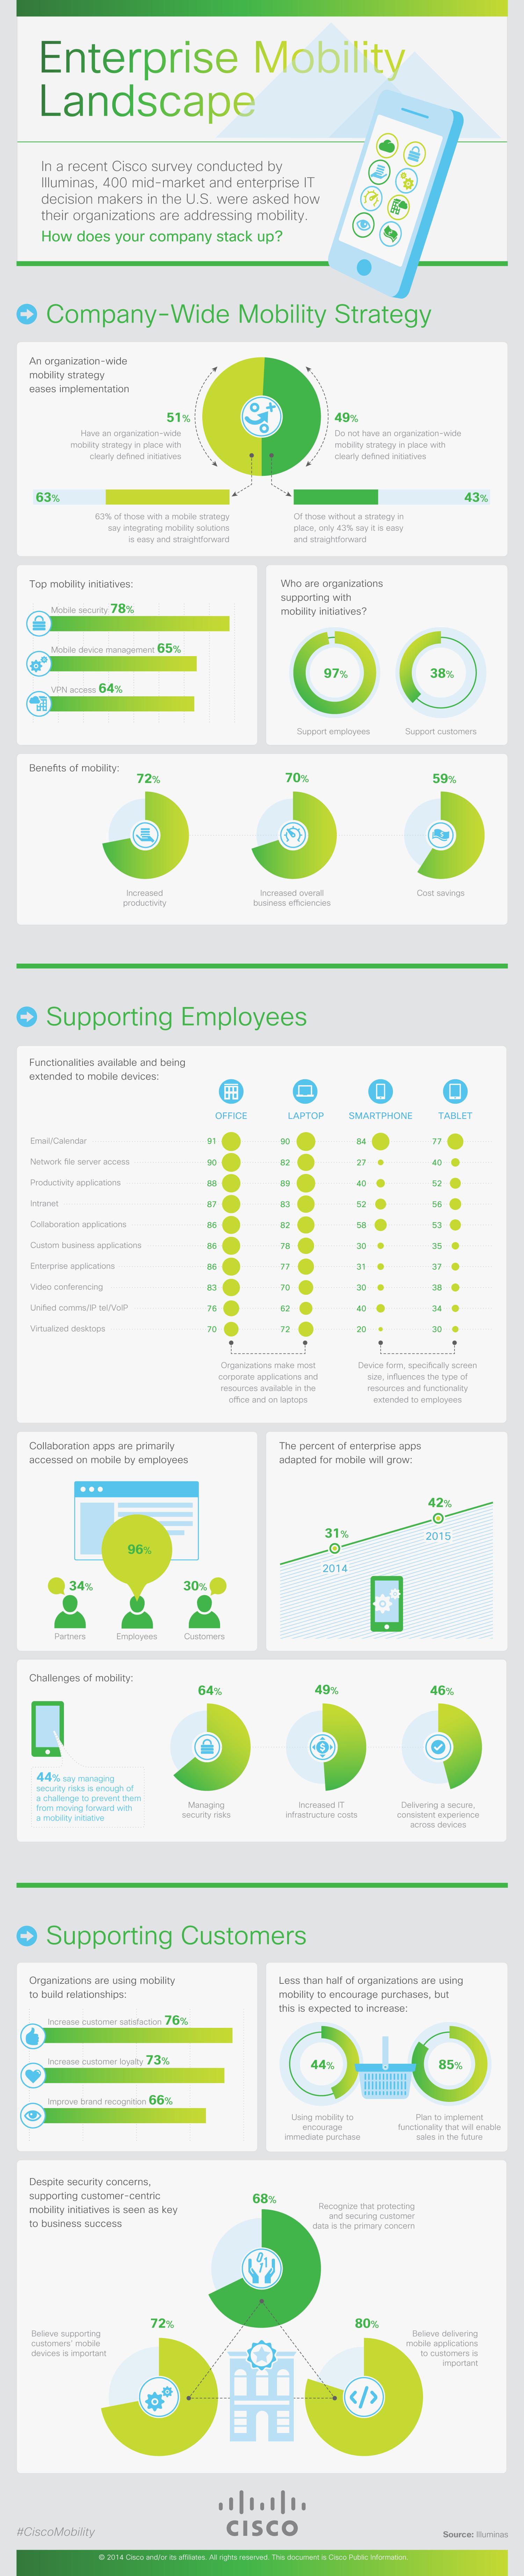 Enterprise Mobility Landscape | Infographic | Makemark